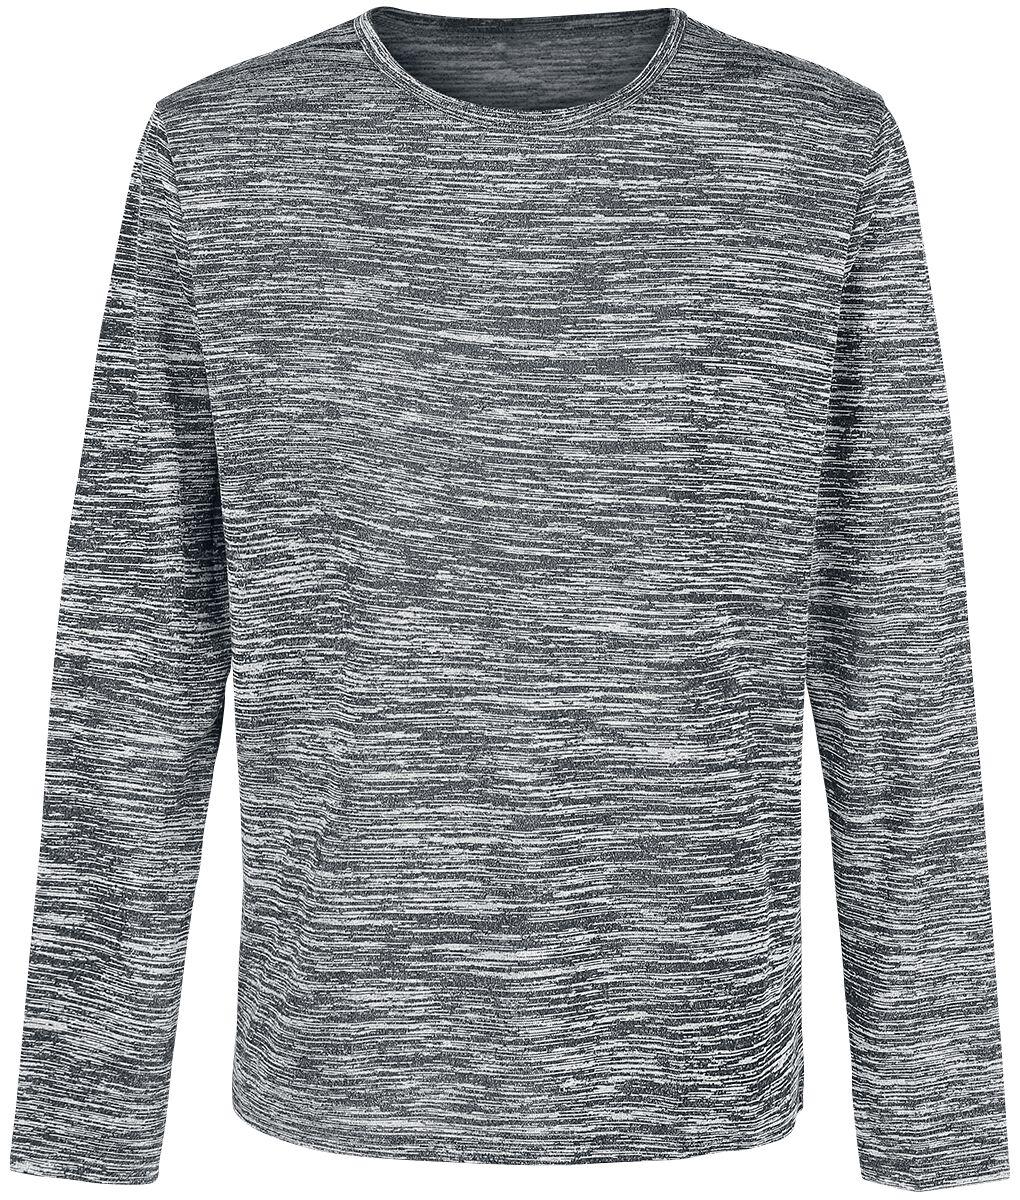 Image of   Forplay Heavy Melange Sweater Sweatshirt grålig